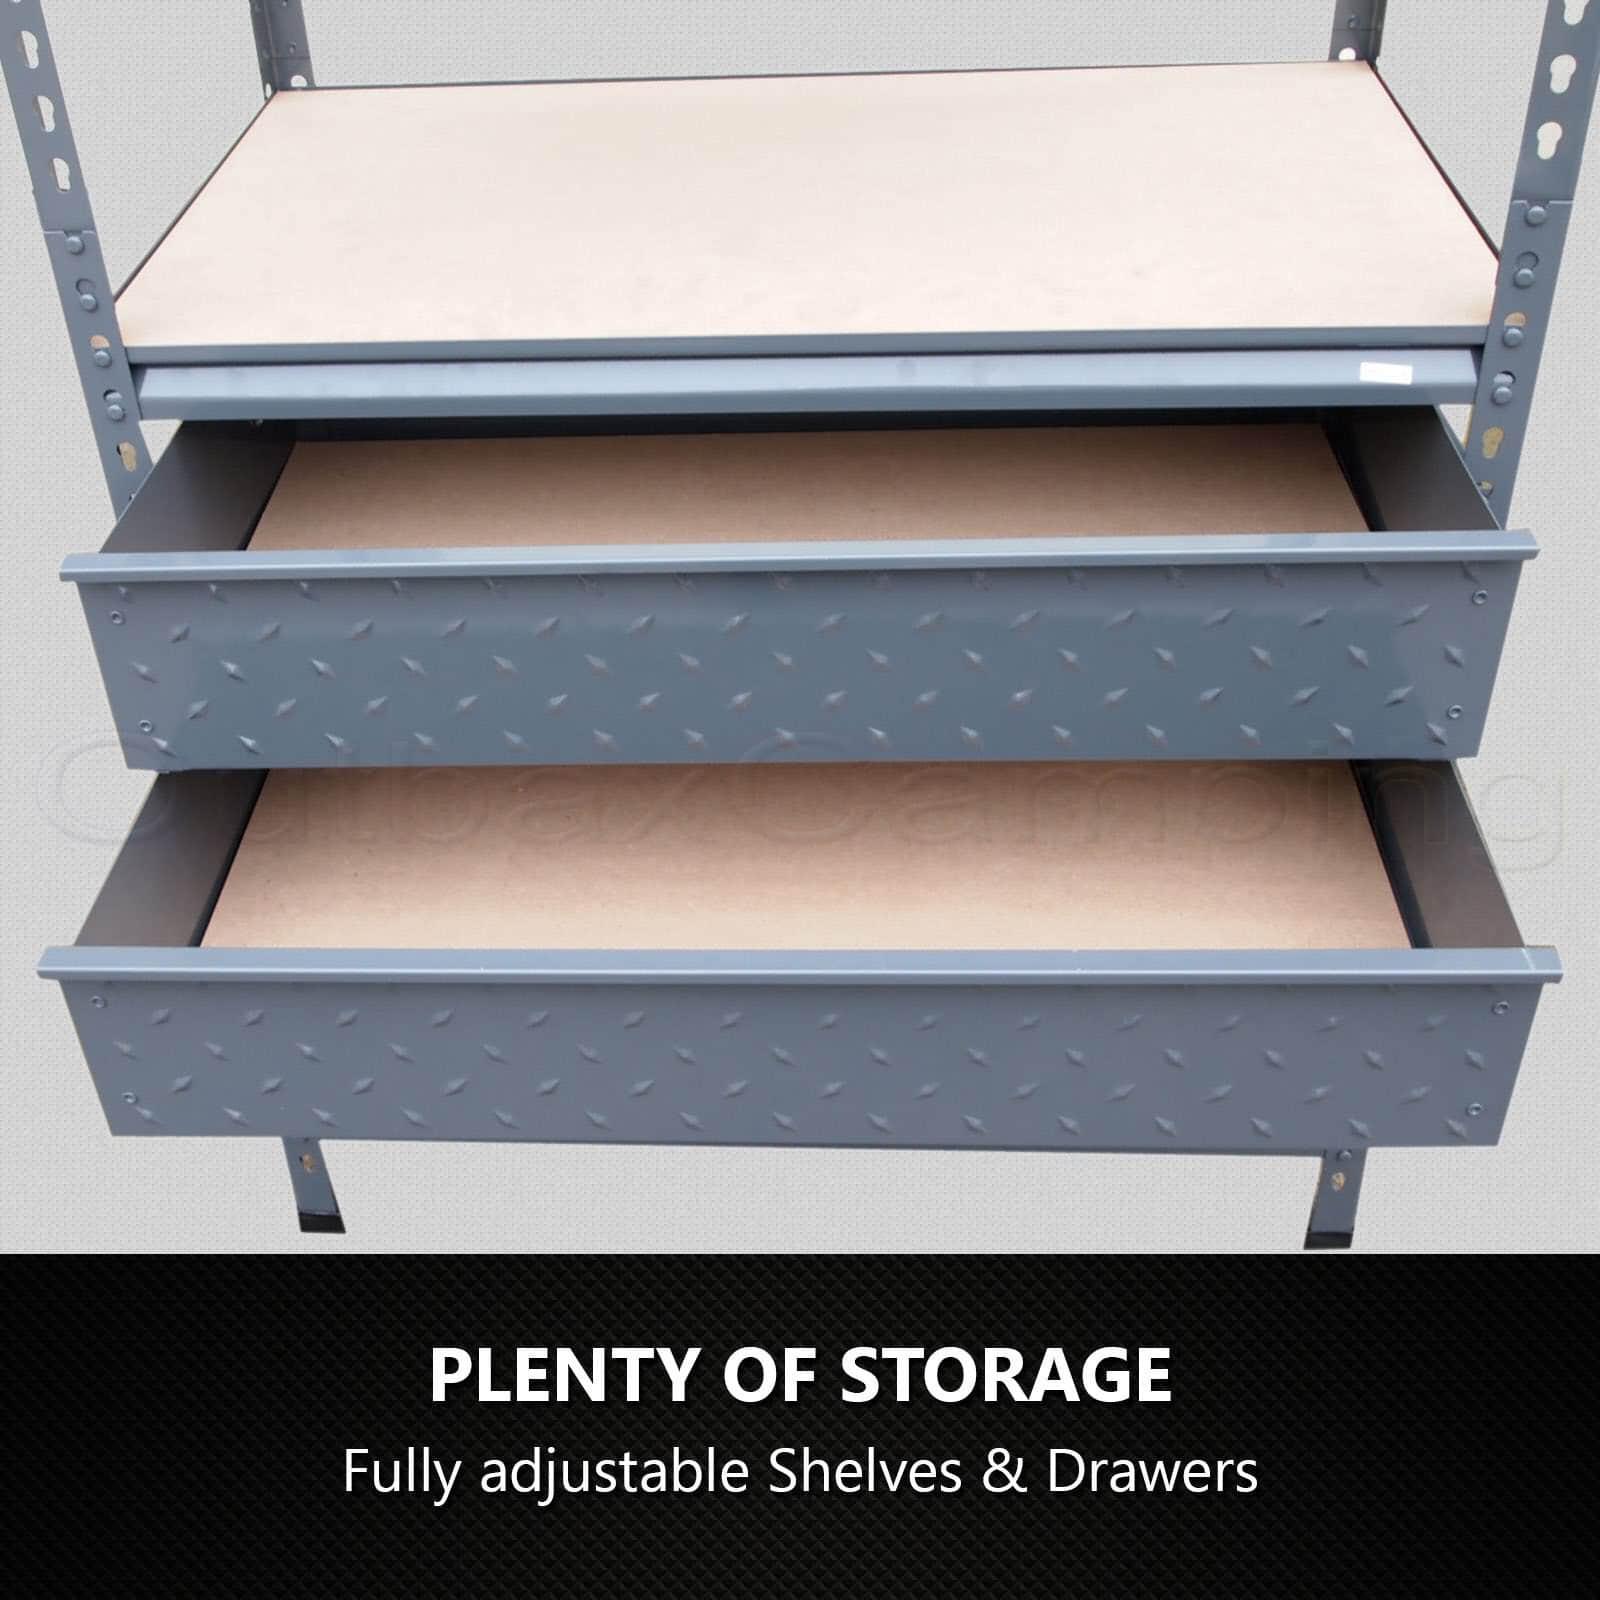 1 9m X 0 Garage Shelving Adjustable